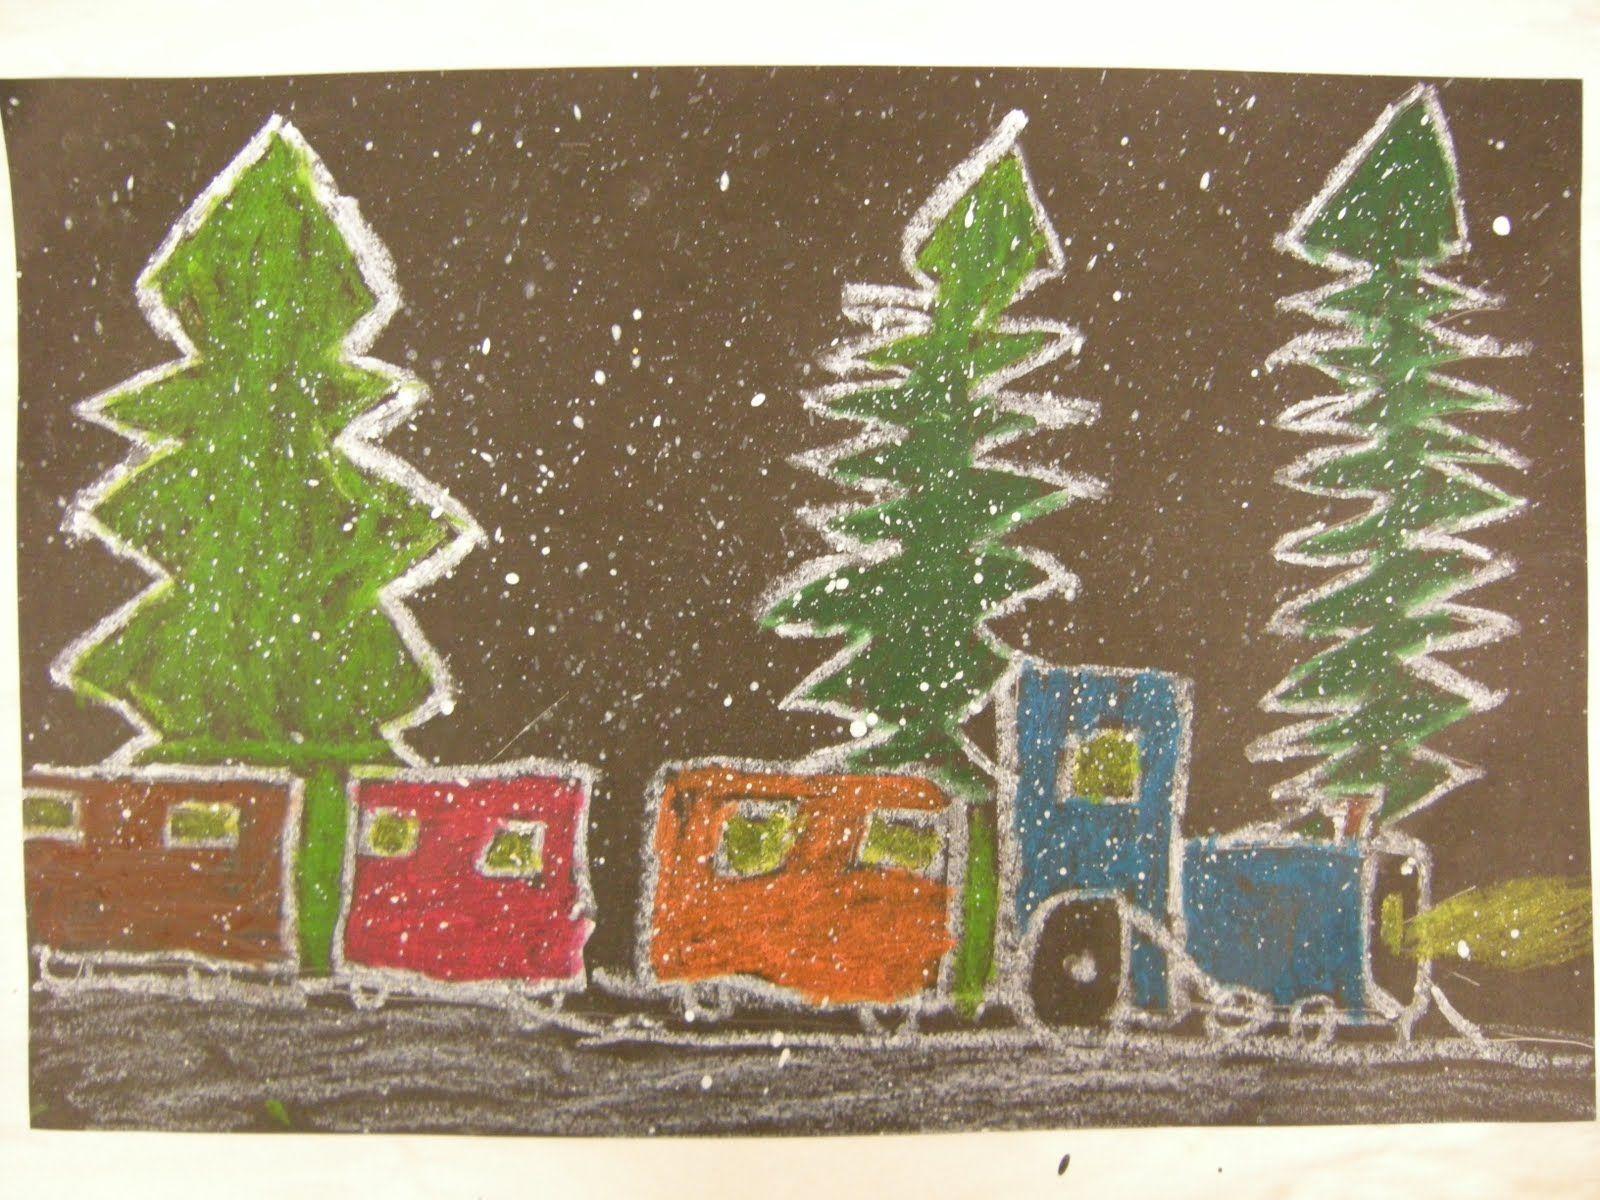 The Polar Express Draw Polar Express Trains Using Oil